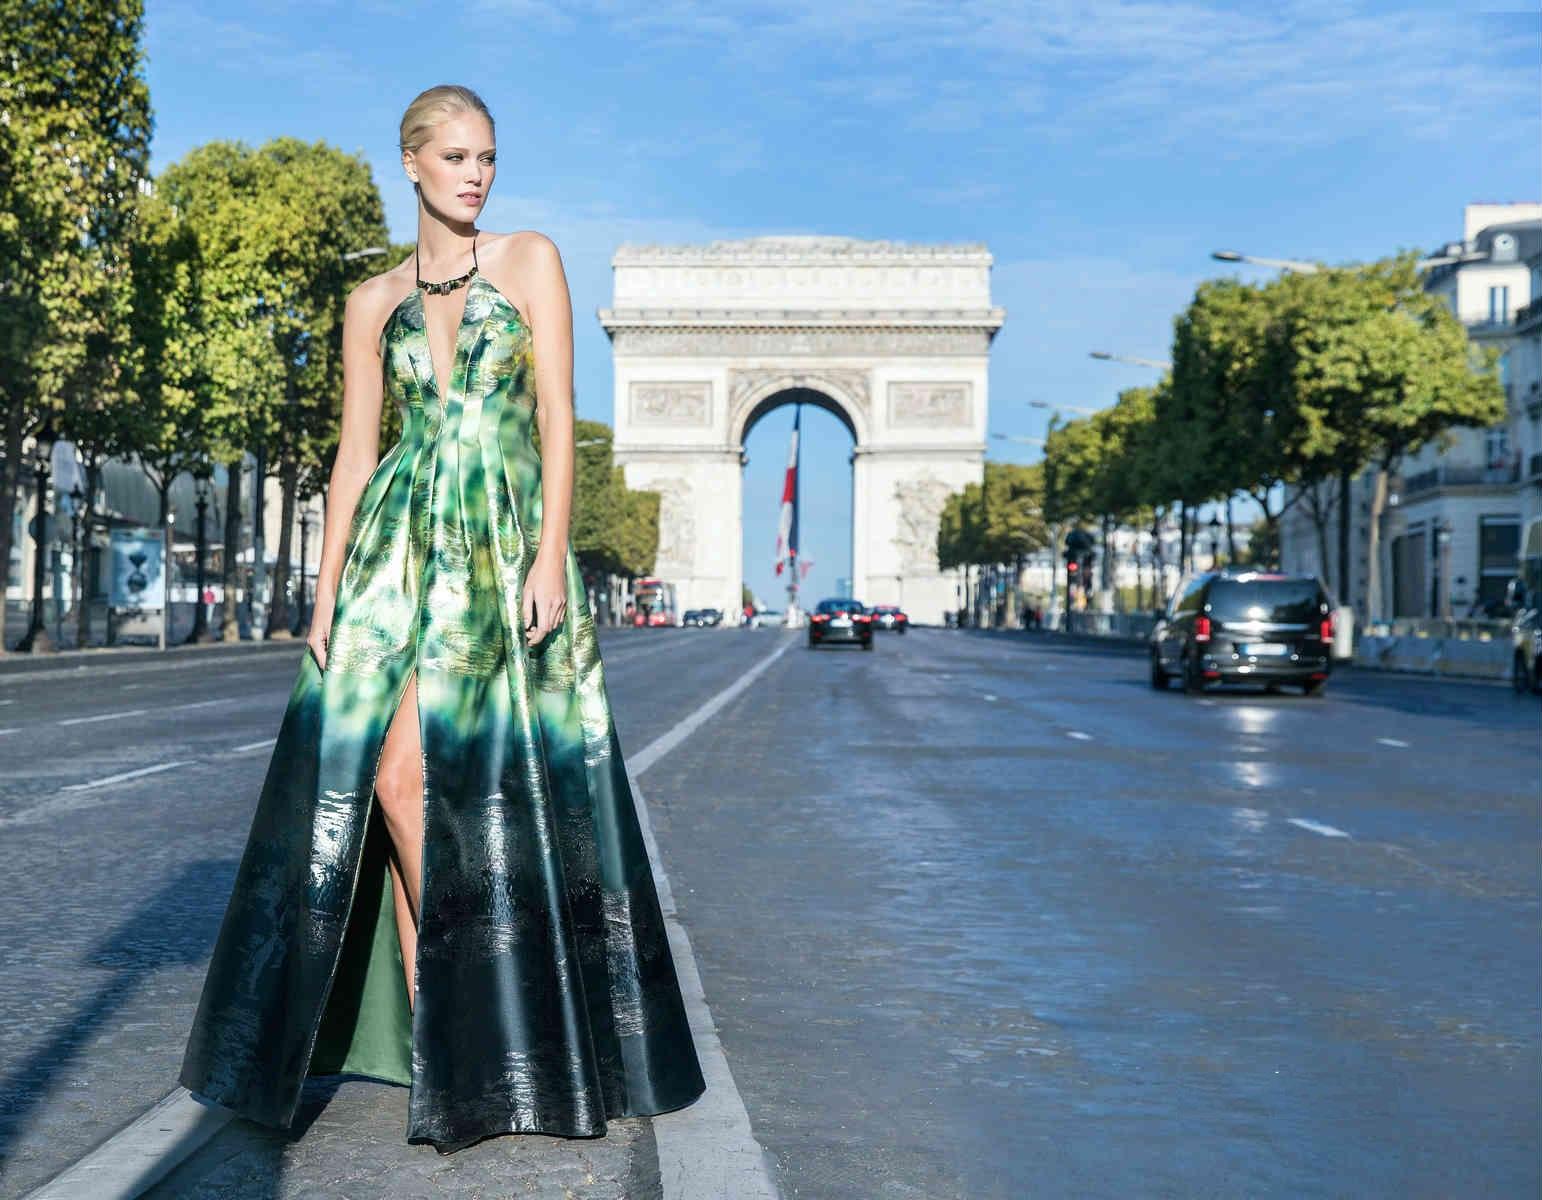 ea7e19f98f50 Atelier Tsourani Φορέματα Δεξίωσης Atelier Tsourani haute-couture ...